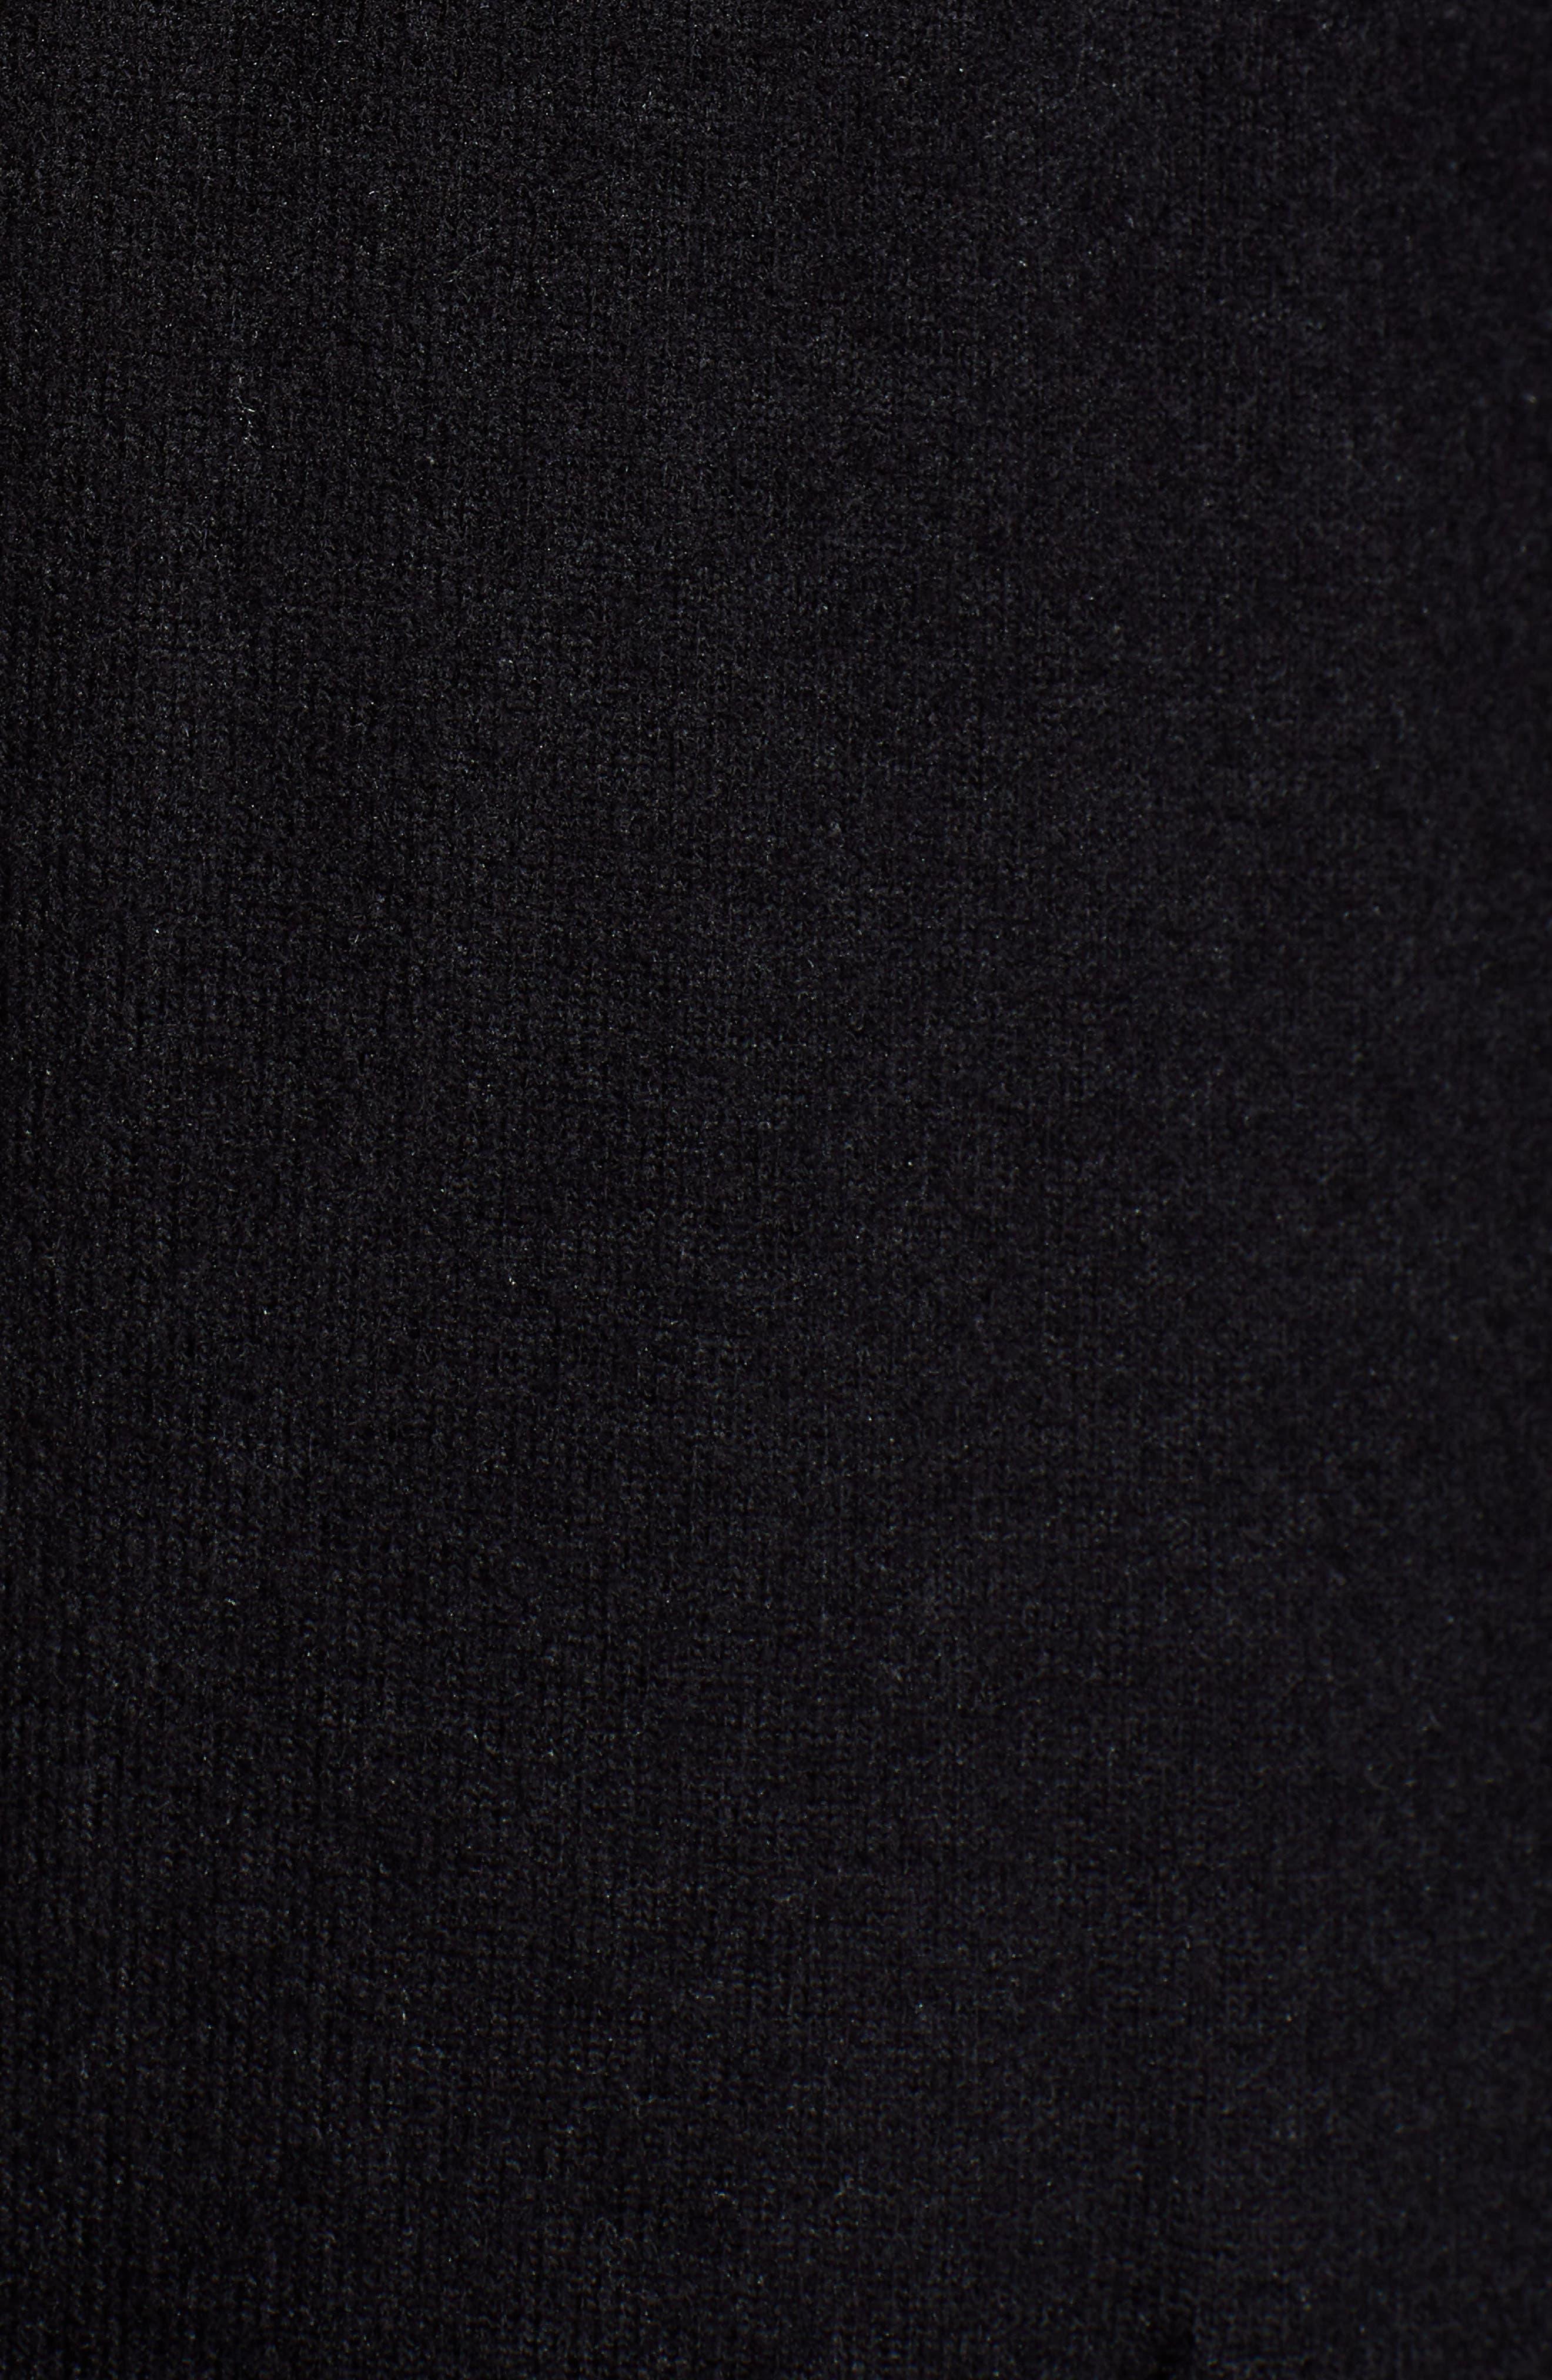 Long Fleece Open Cardigan,                             Alternate thumbnail 6, color,                             001